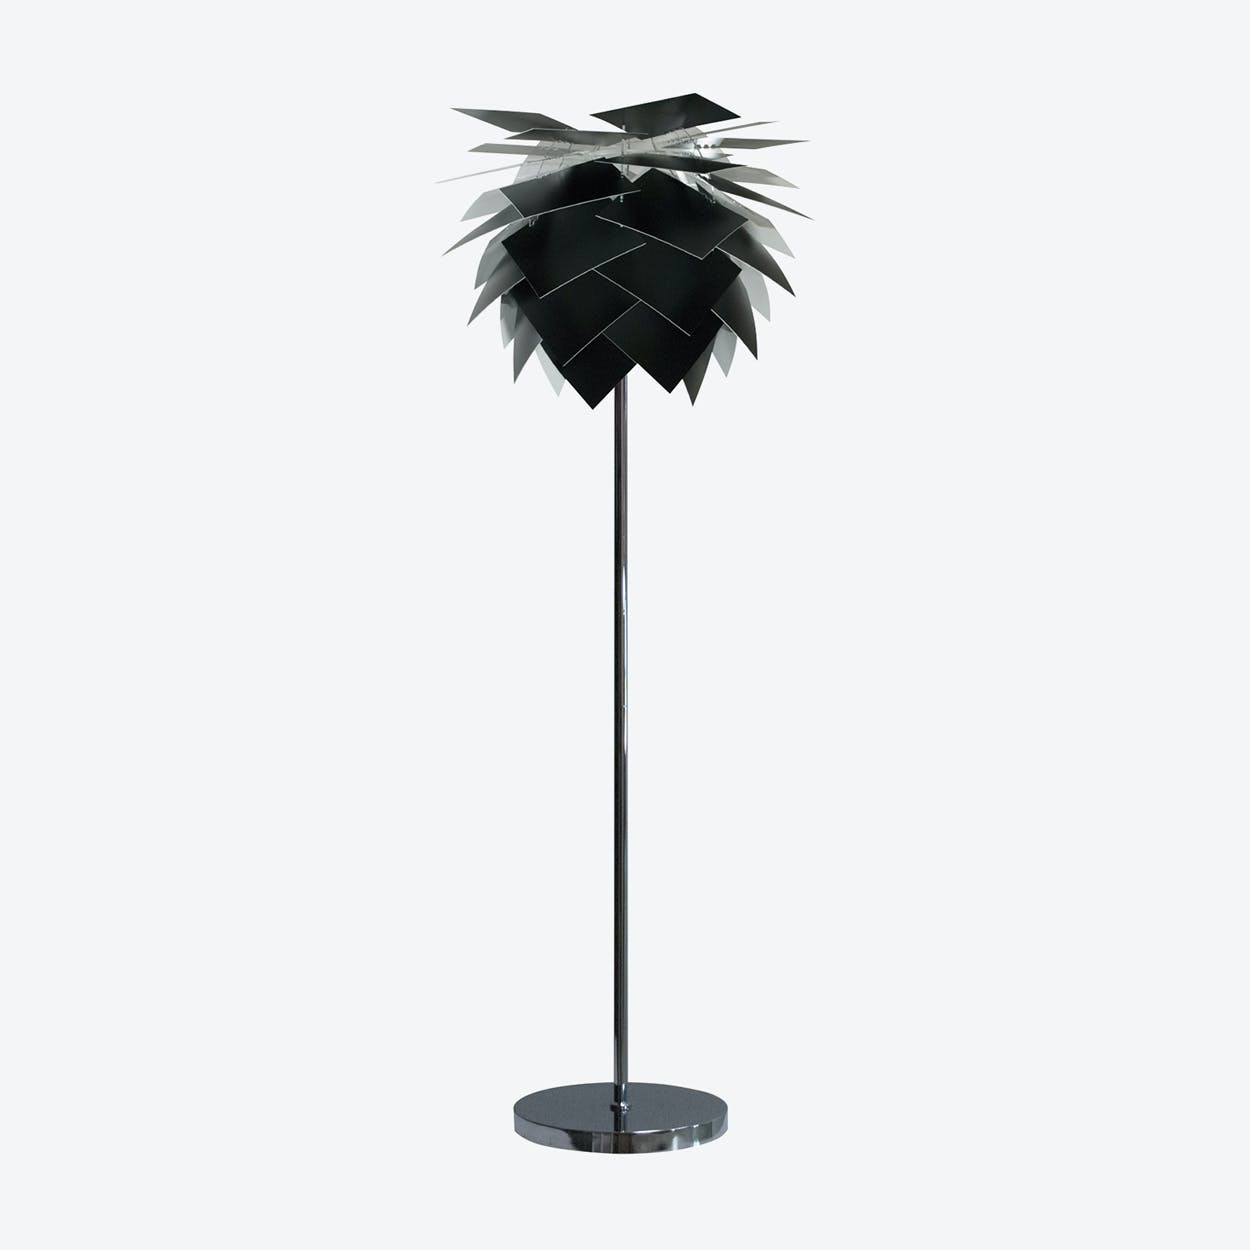 Special Edition Medium Black PineApple Floor Lamp in Matte Satin Finish